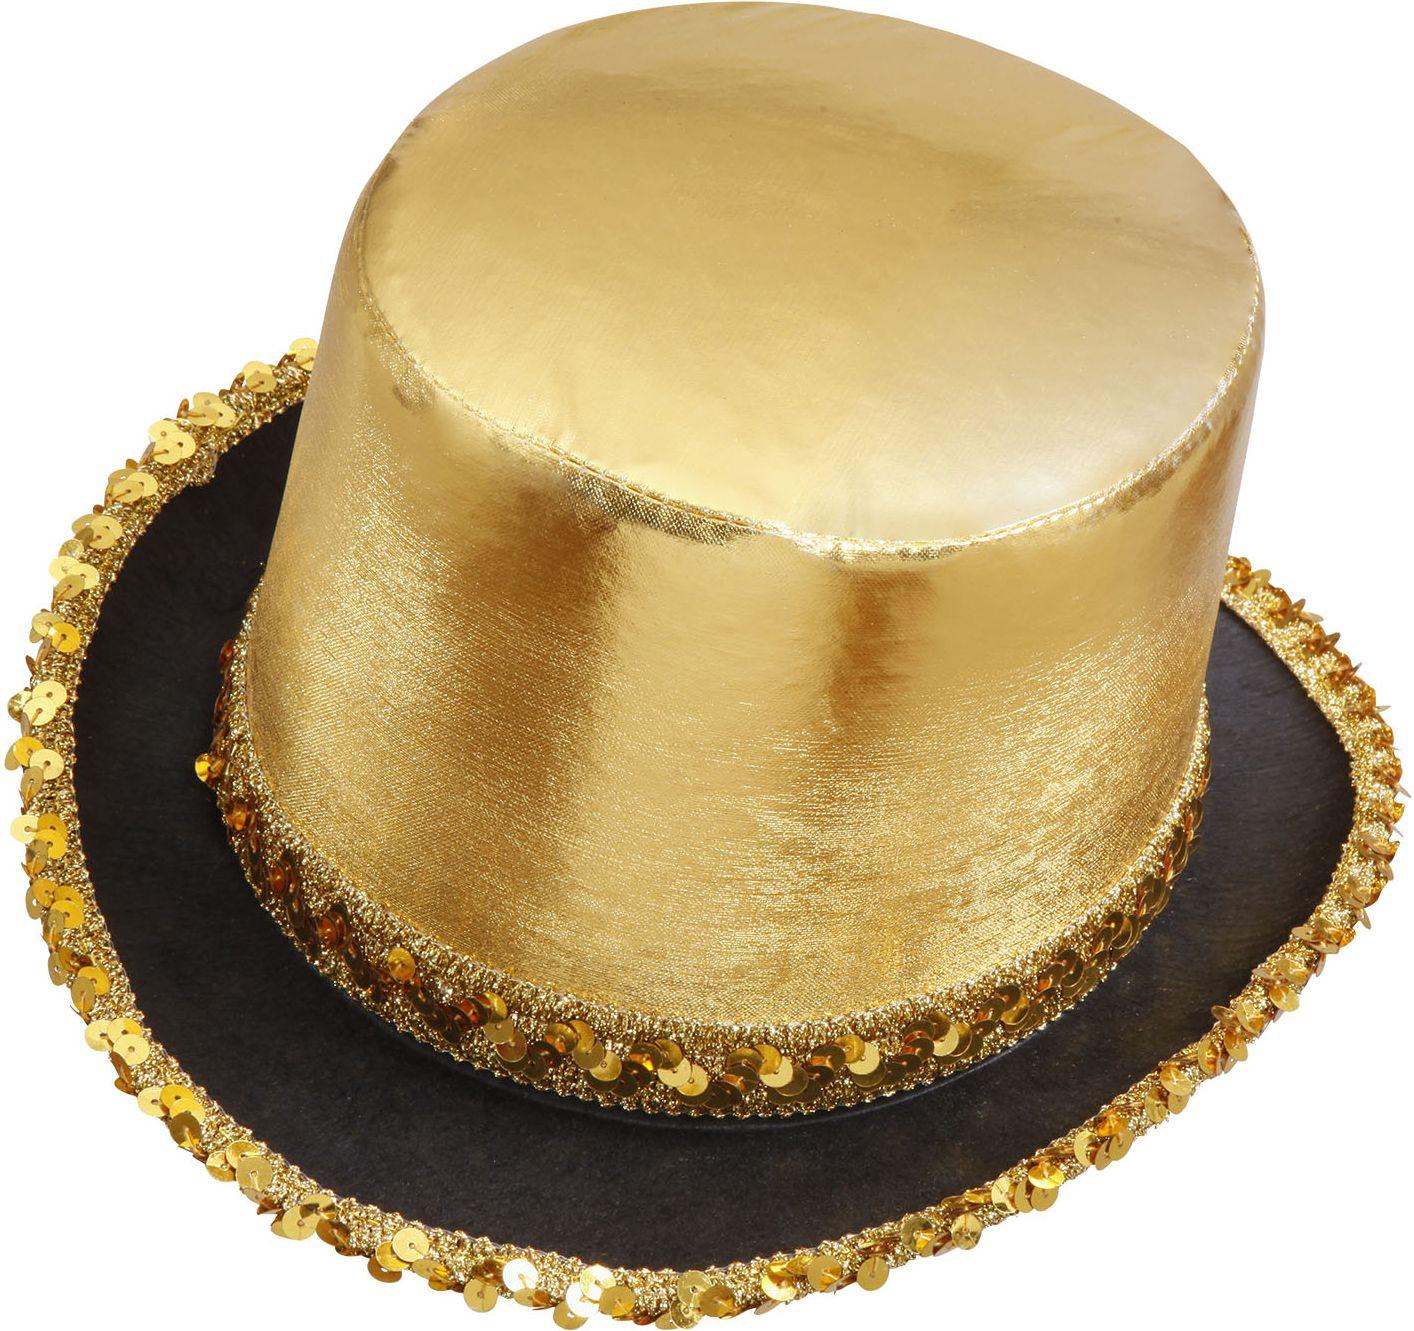 Hoge hoed met pailletten rand goud